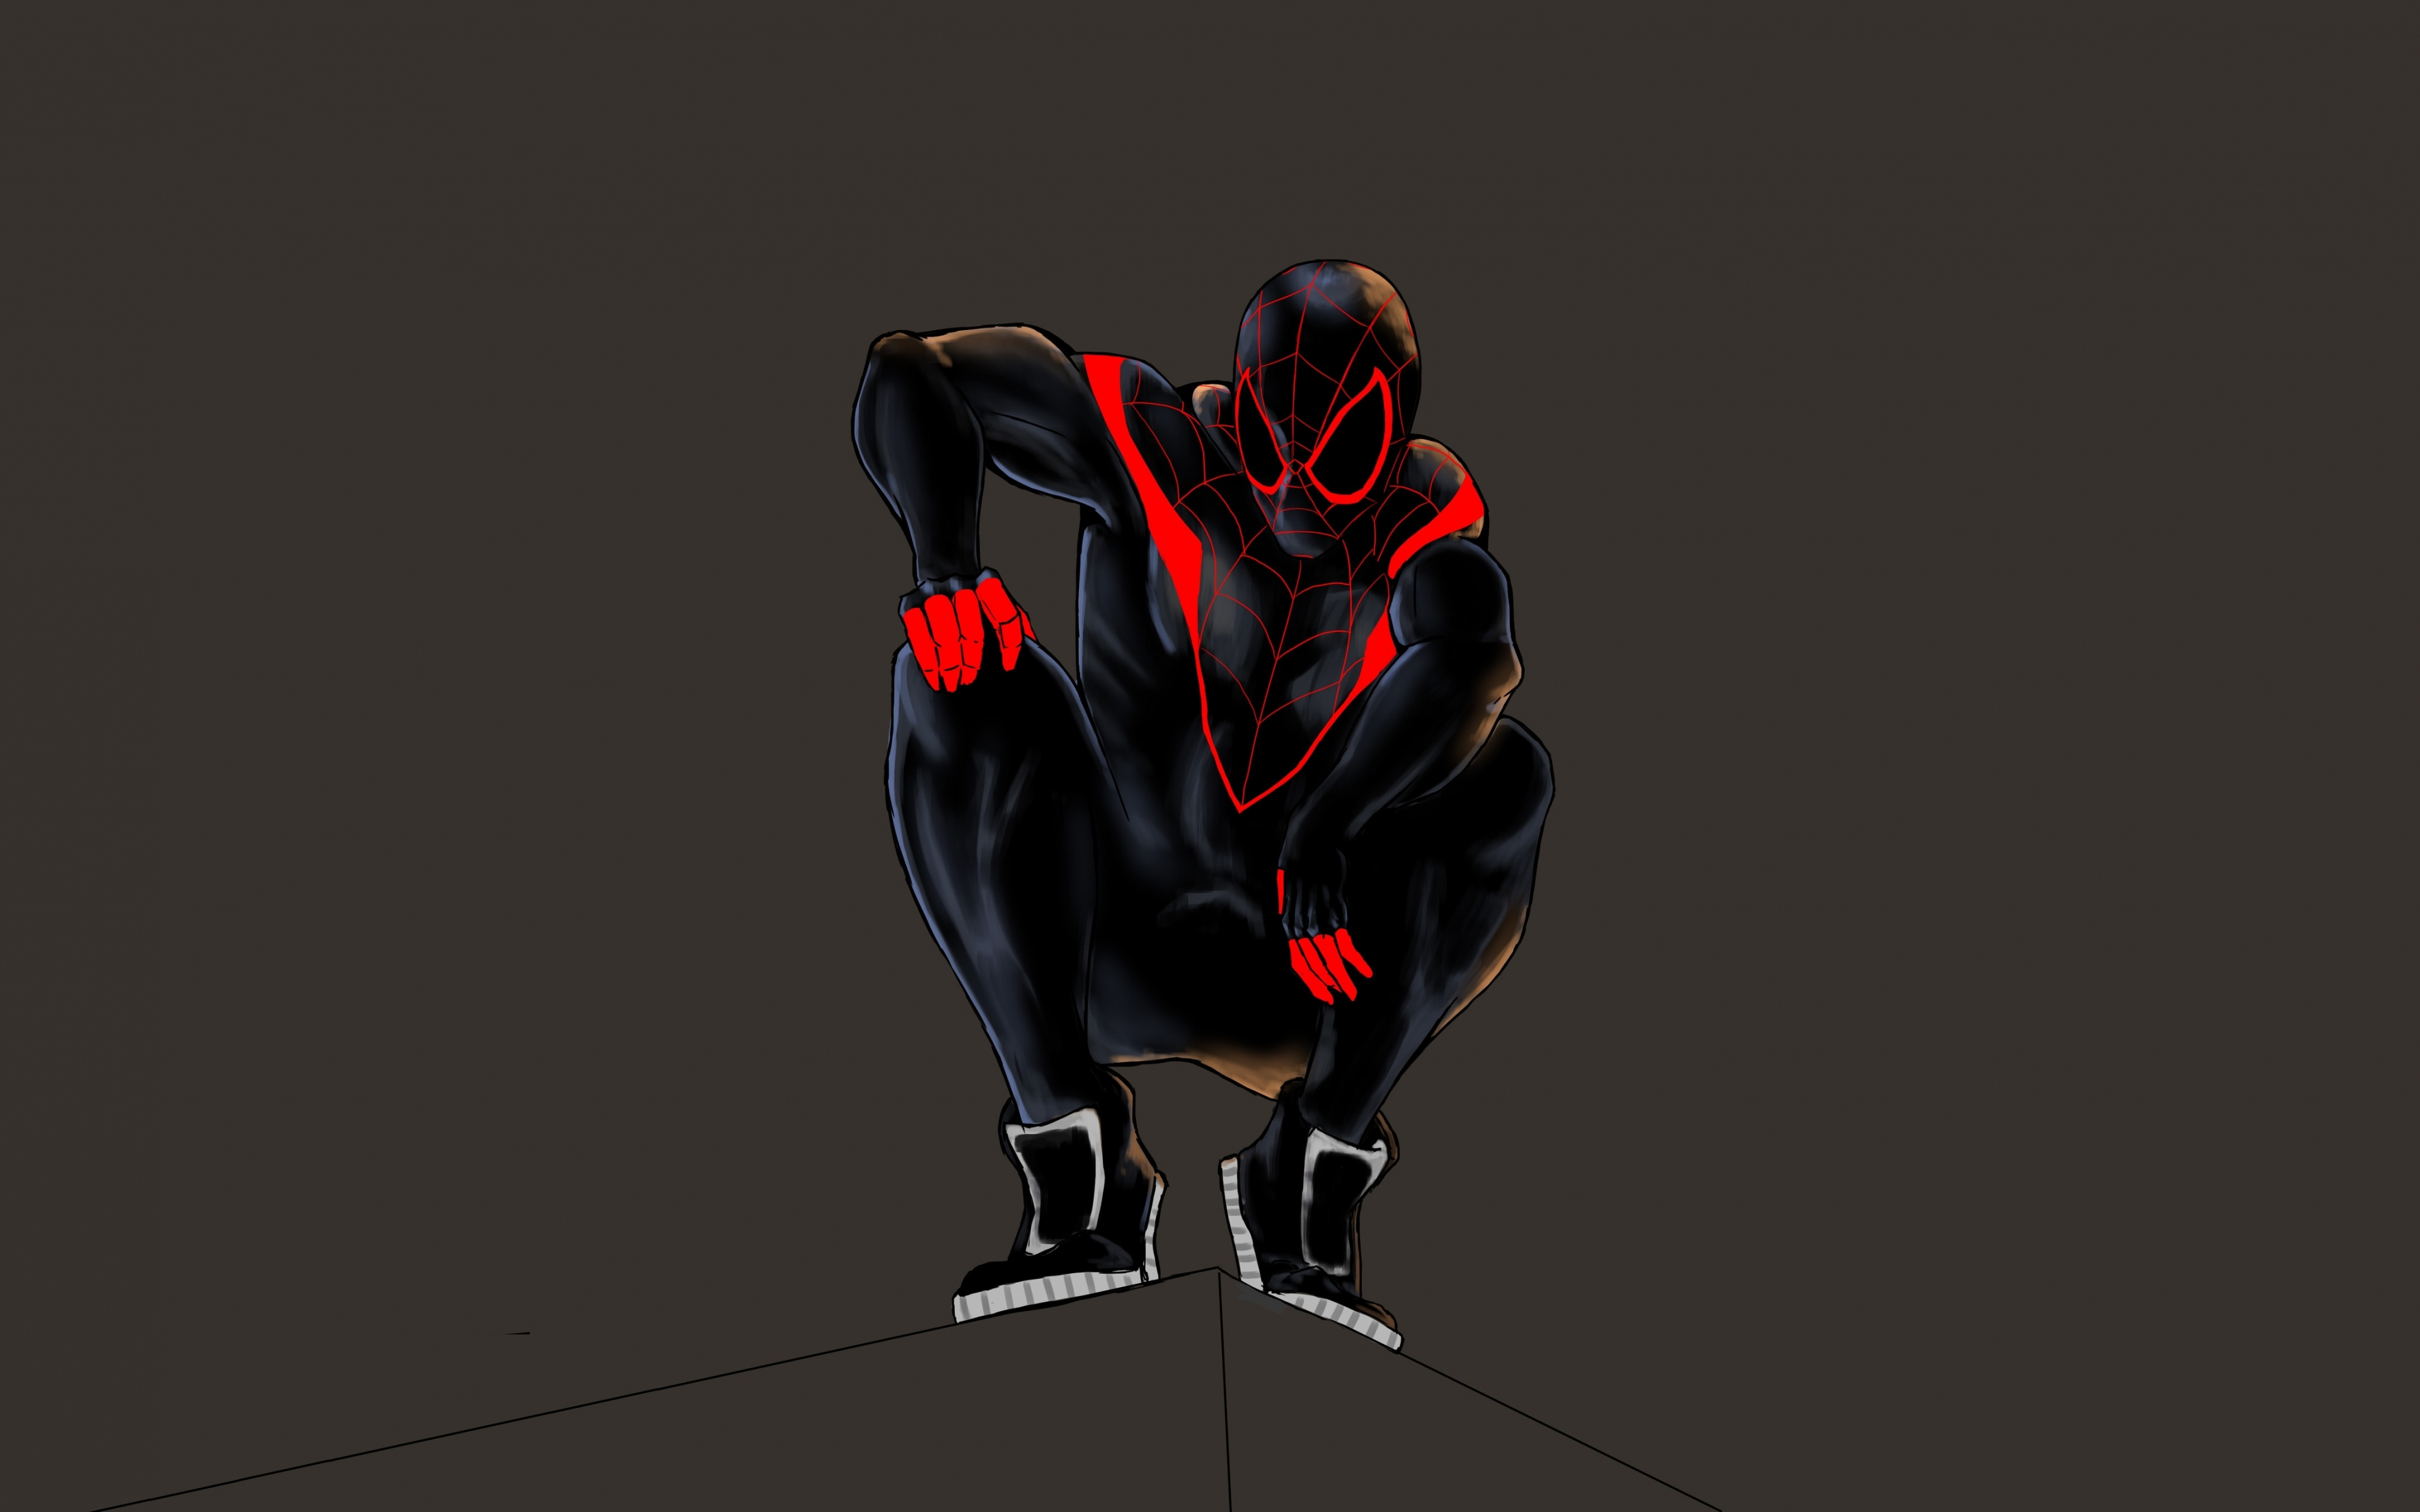 Download 3840x2400 Wallpaper Black Spider Man Minimal